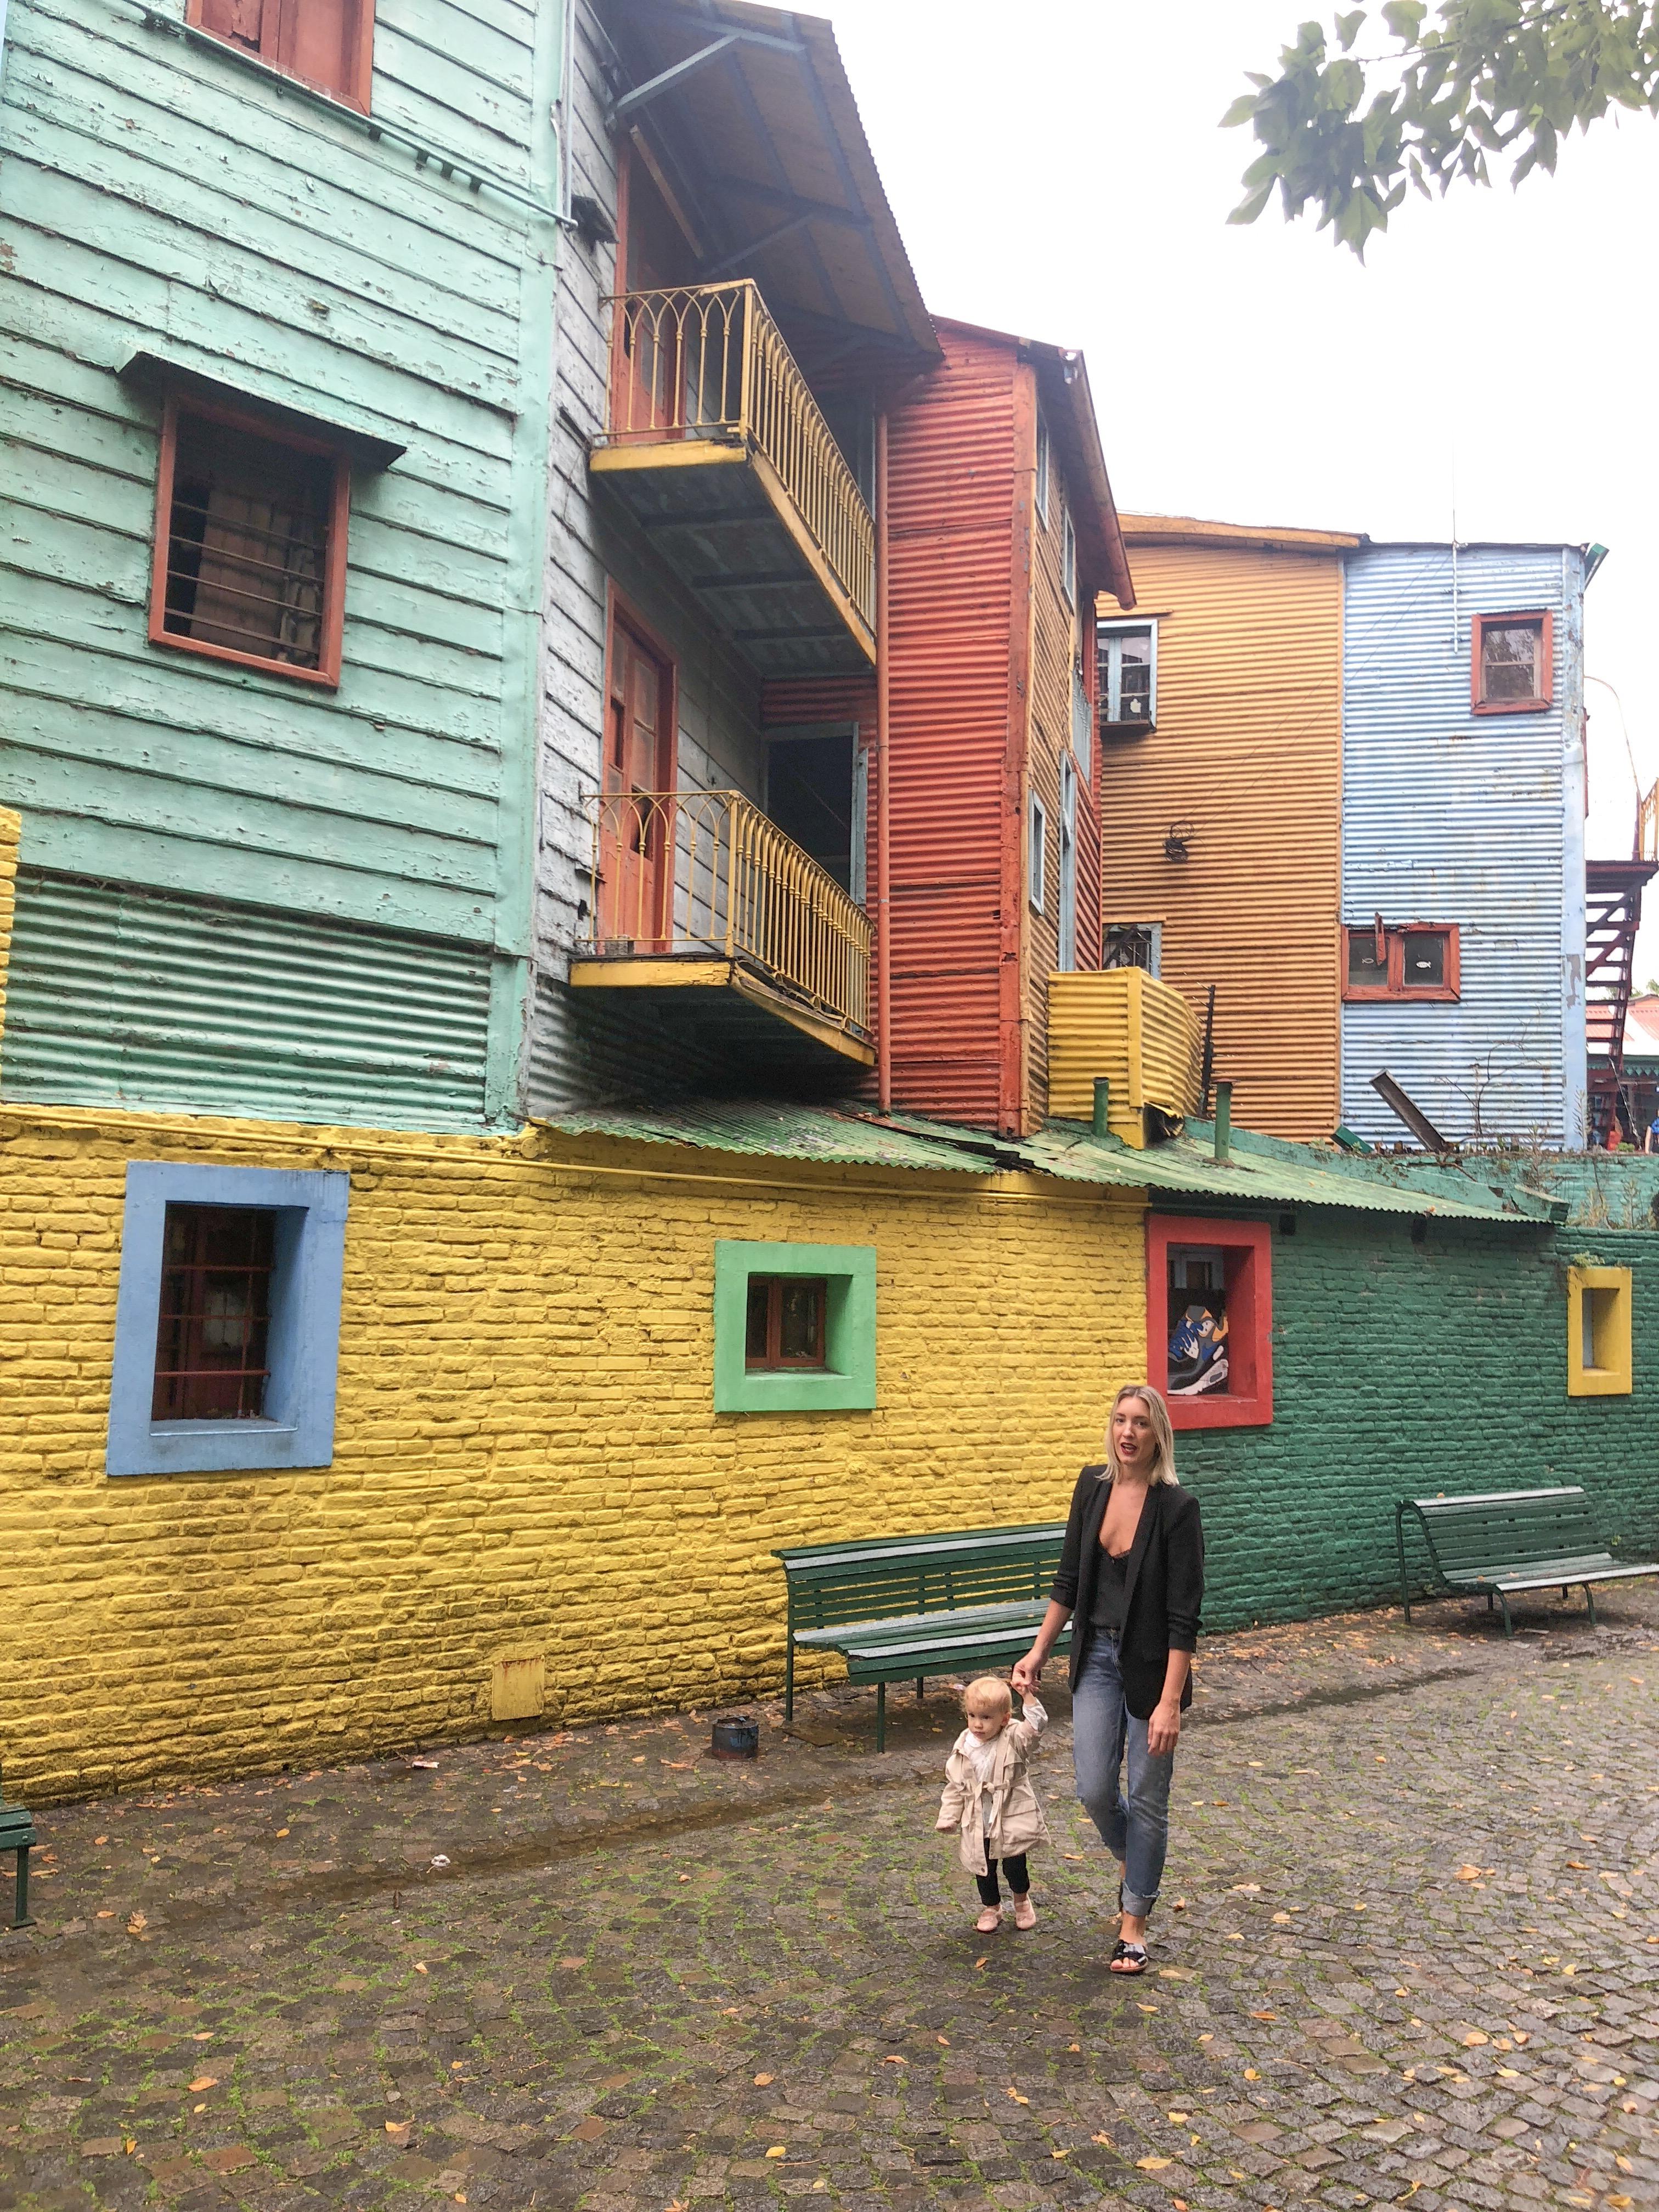 Bairro el Caminito Buenos Aires , La boca Buenos Aires , o que fazer em Buenos Aires